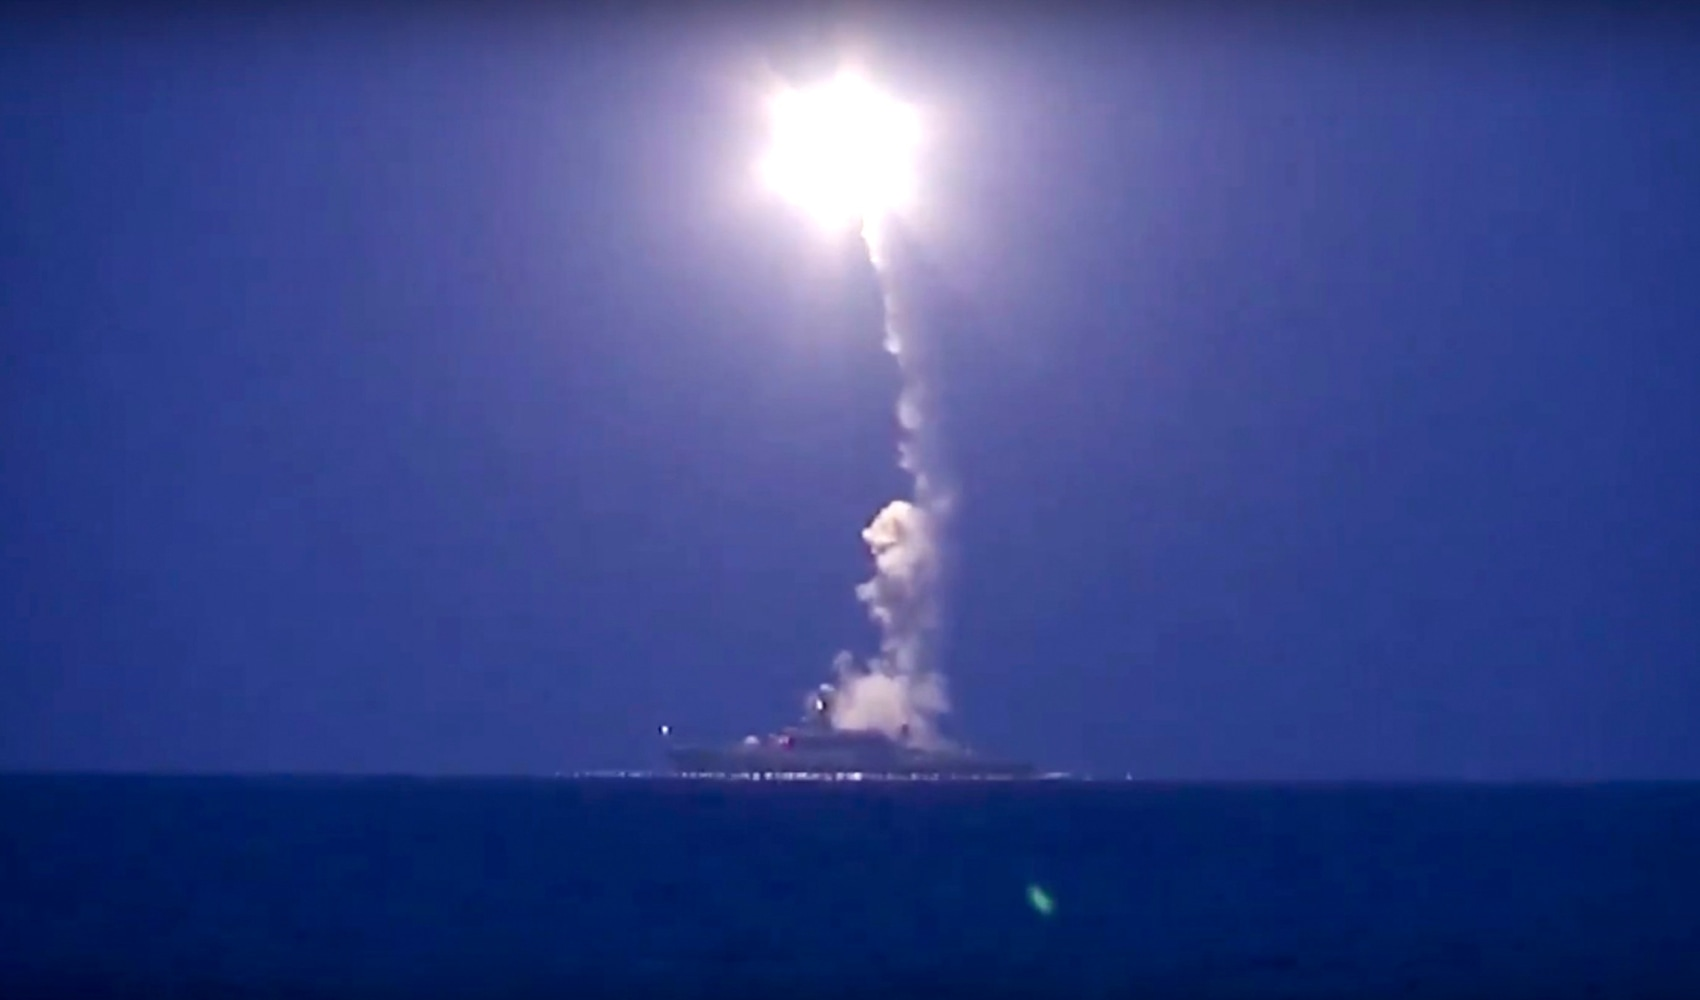 NATO znepokojilo možné zapojení Admirála Kuzněcova do útoků na Aleppo